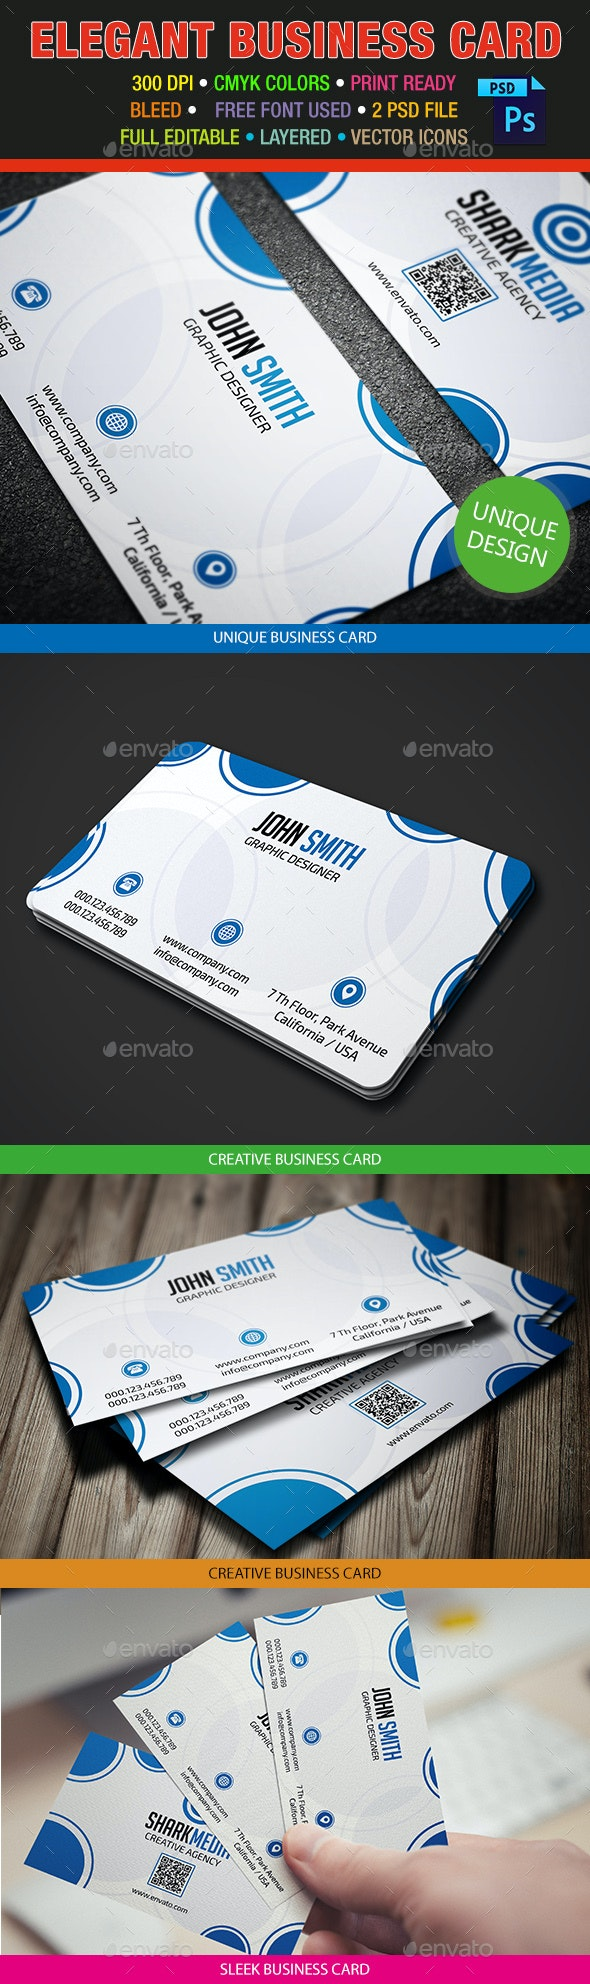 Elegant Business Card 380 - Creative Business Cards